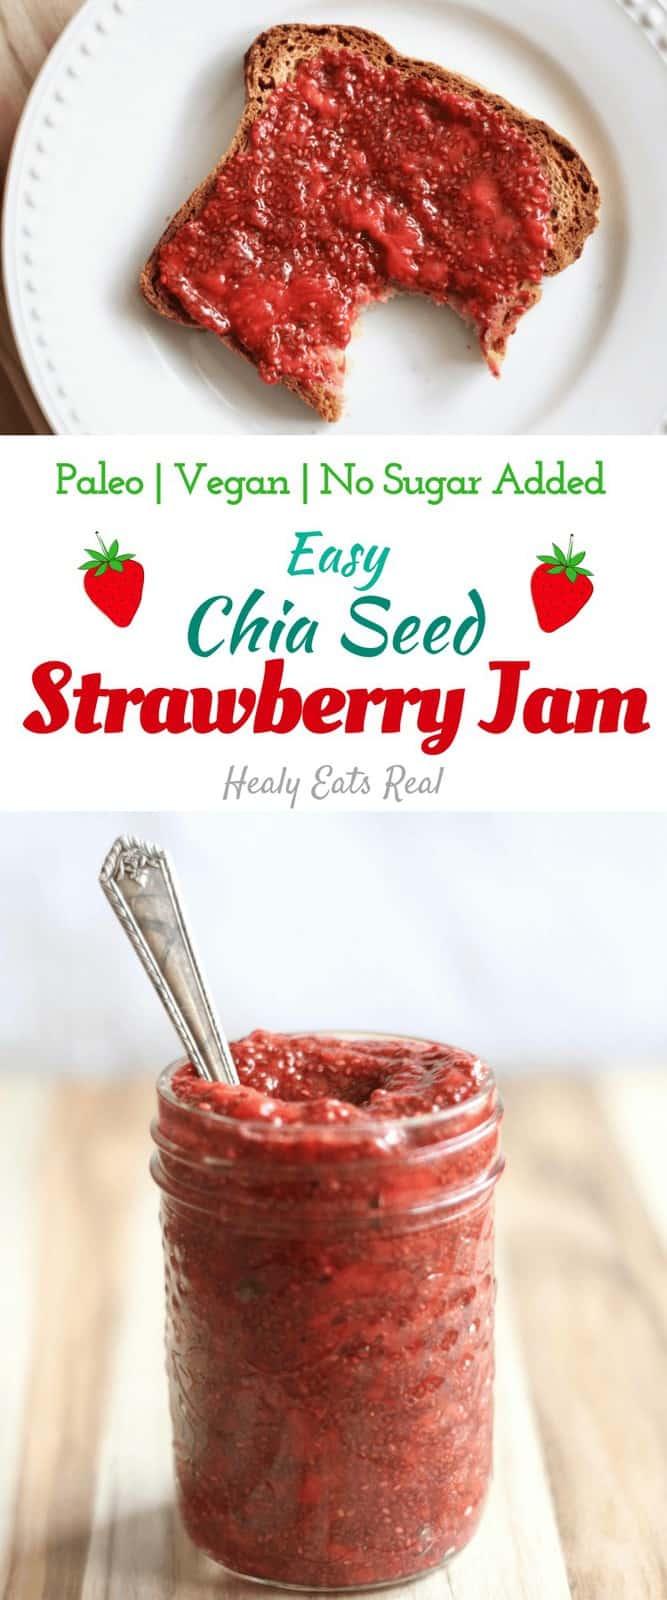 Quick Chia Seed Strawberry Jam Recipe (Paleo & Vegan) - This quick and easy chia seed strawberry jam recipe is paleo, vegan and packed with fruity goodness...all without sugar or pectin! #jam #strawberry #chia #preserves #healyeatsreal